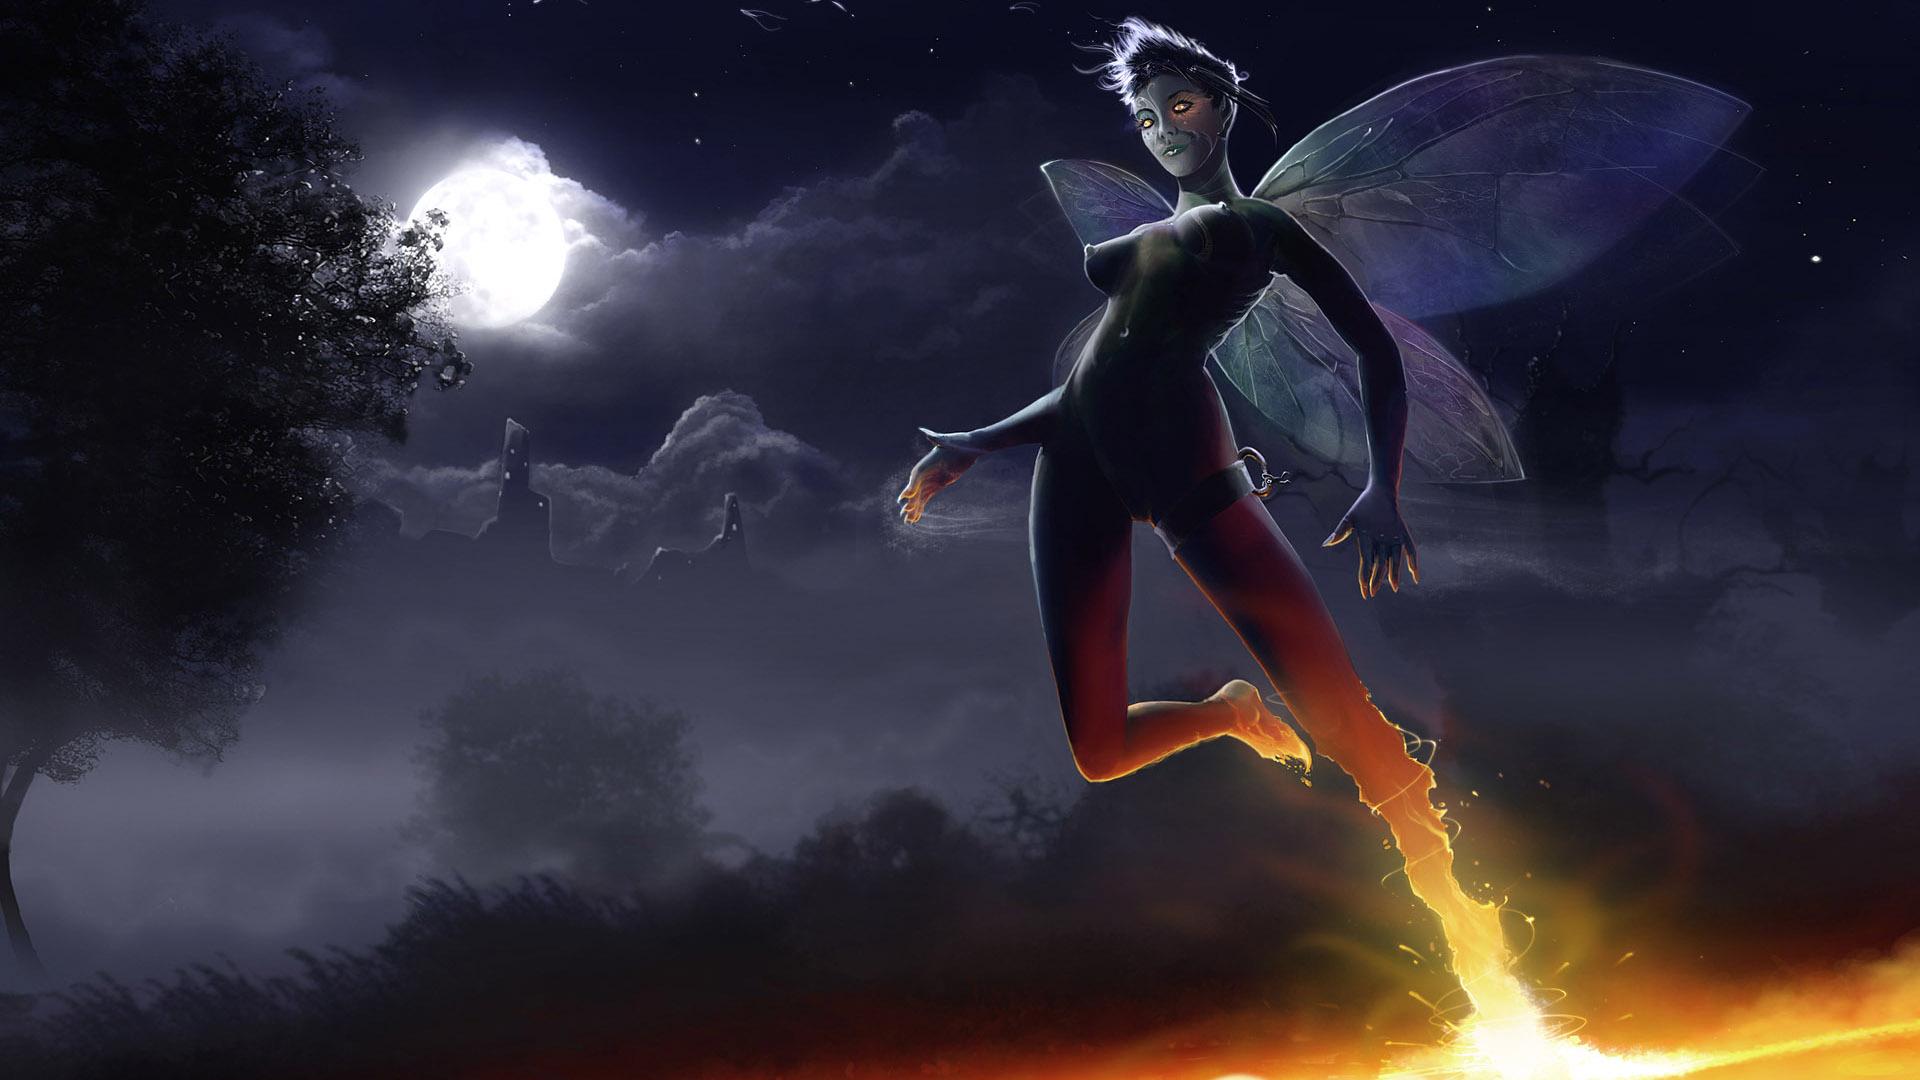 Hd Anime Wallpapers 1080p - WallpaperSafari